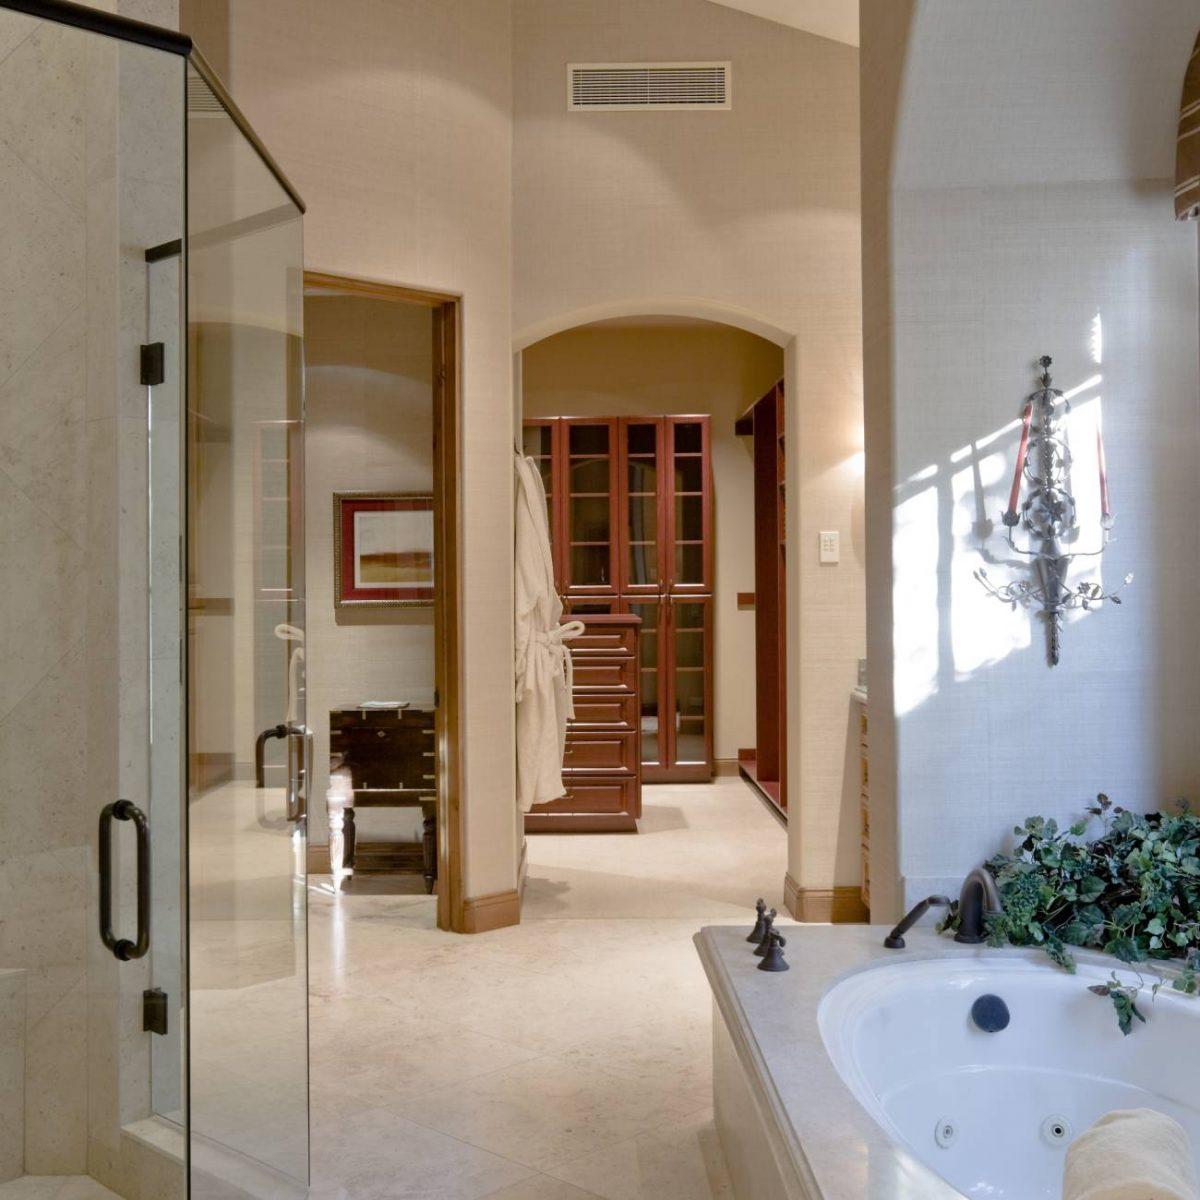 millcreek-utah-best-house-cleaning-service-1300